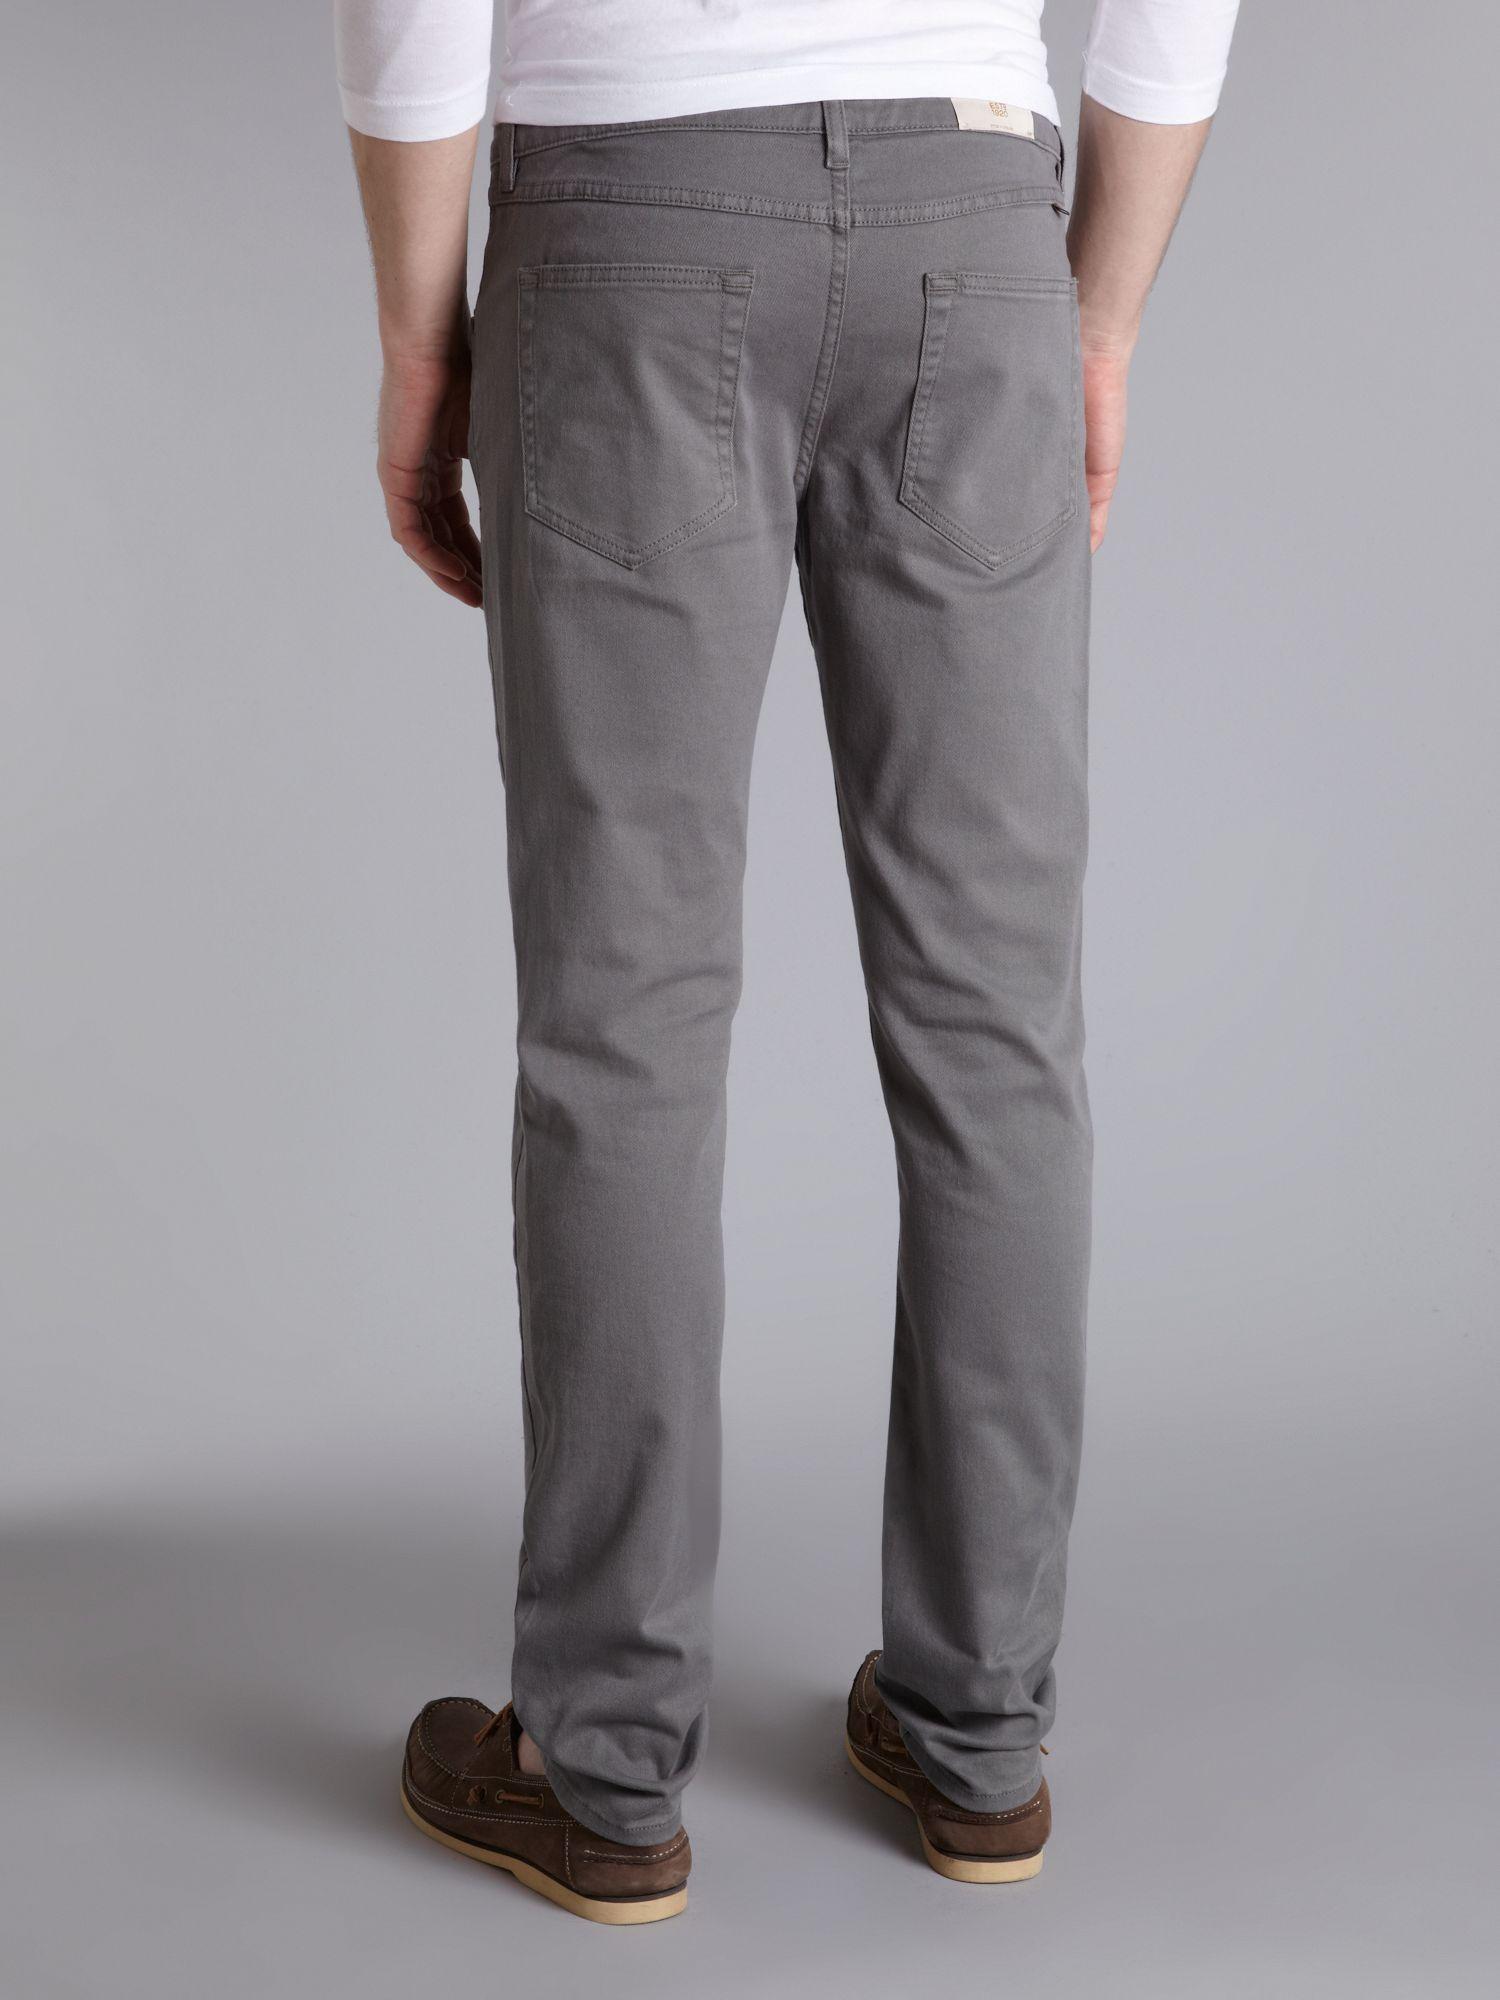 Drake Slim Fit Jean In Grey Twill - Grey Farah E9EHOf